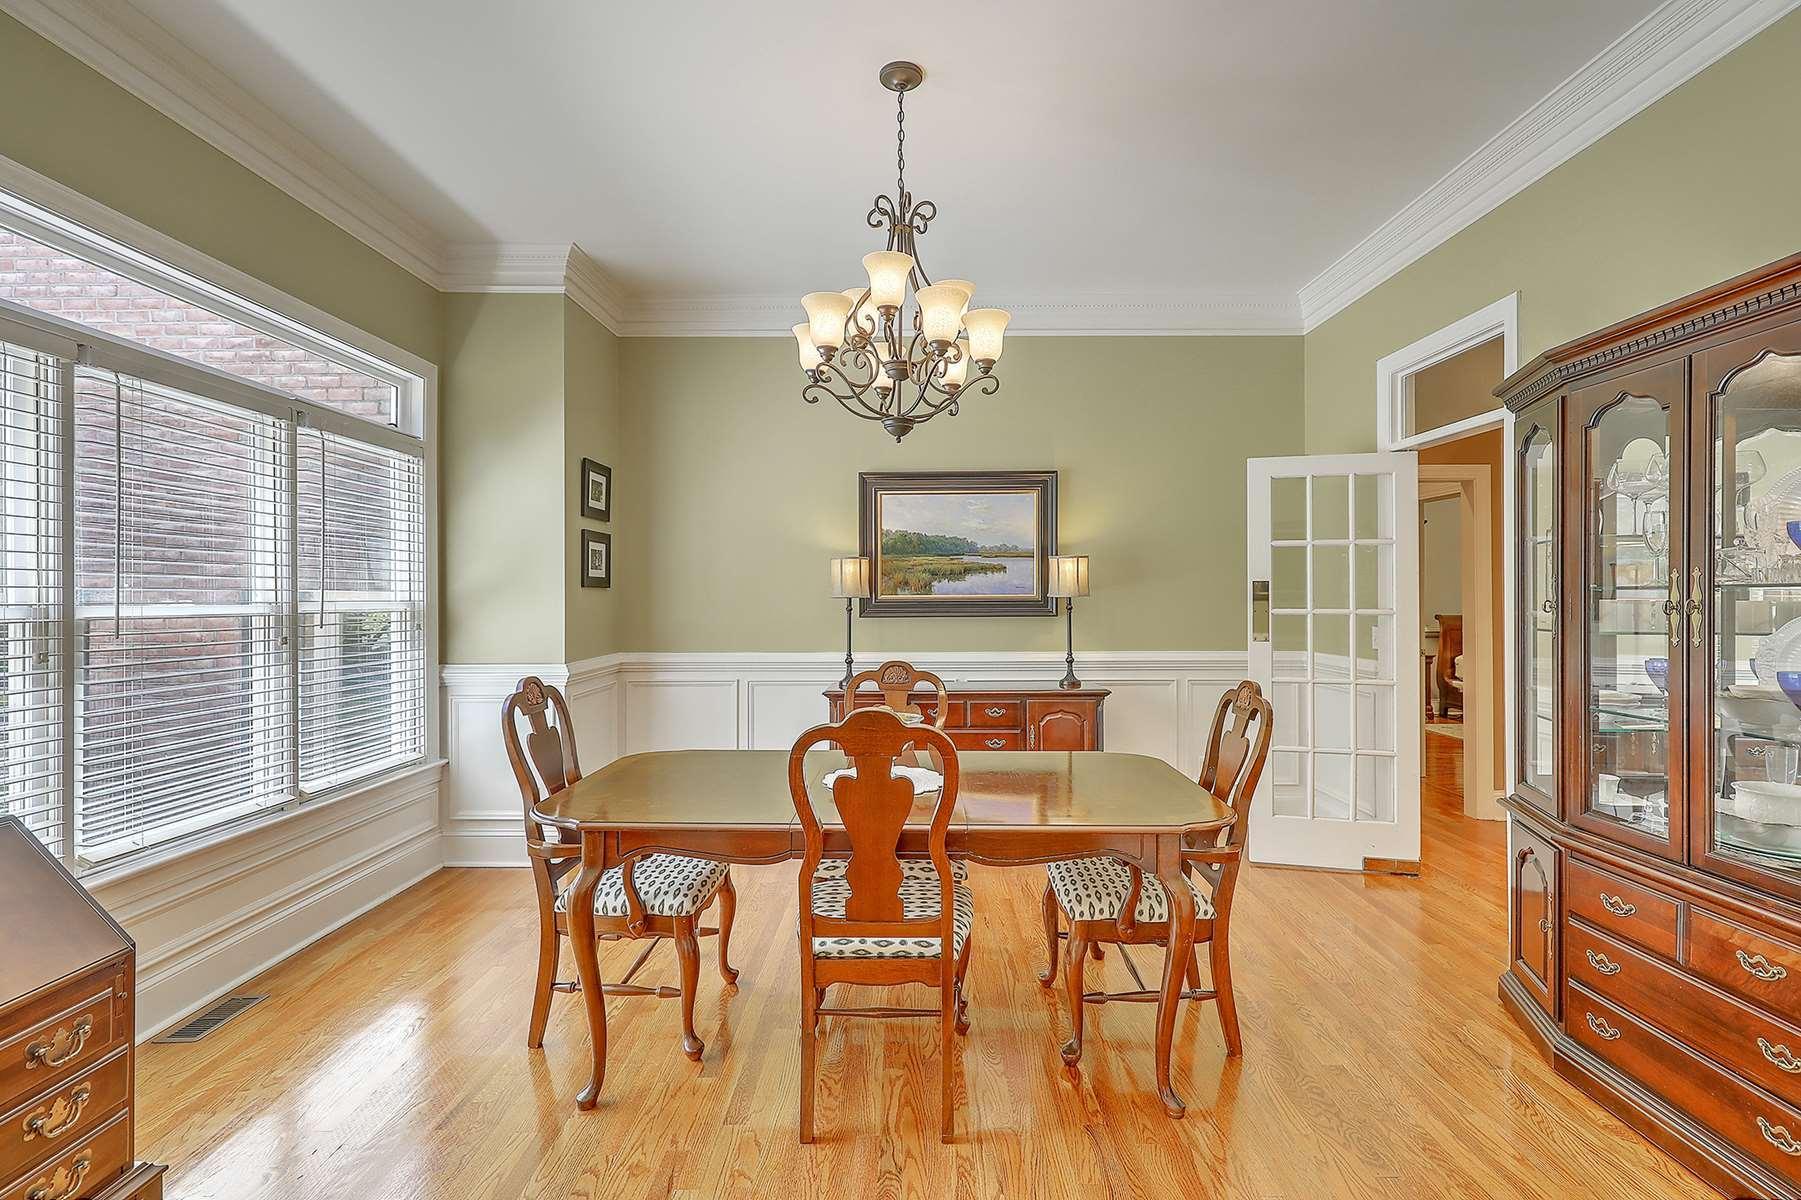 Dunes West Homes For Sale - 2961 Pignatelli, Mount Pleasant, SC - 36